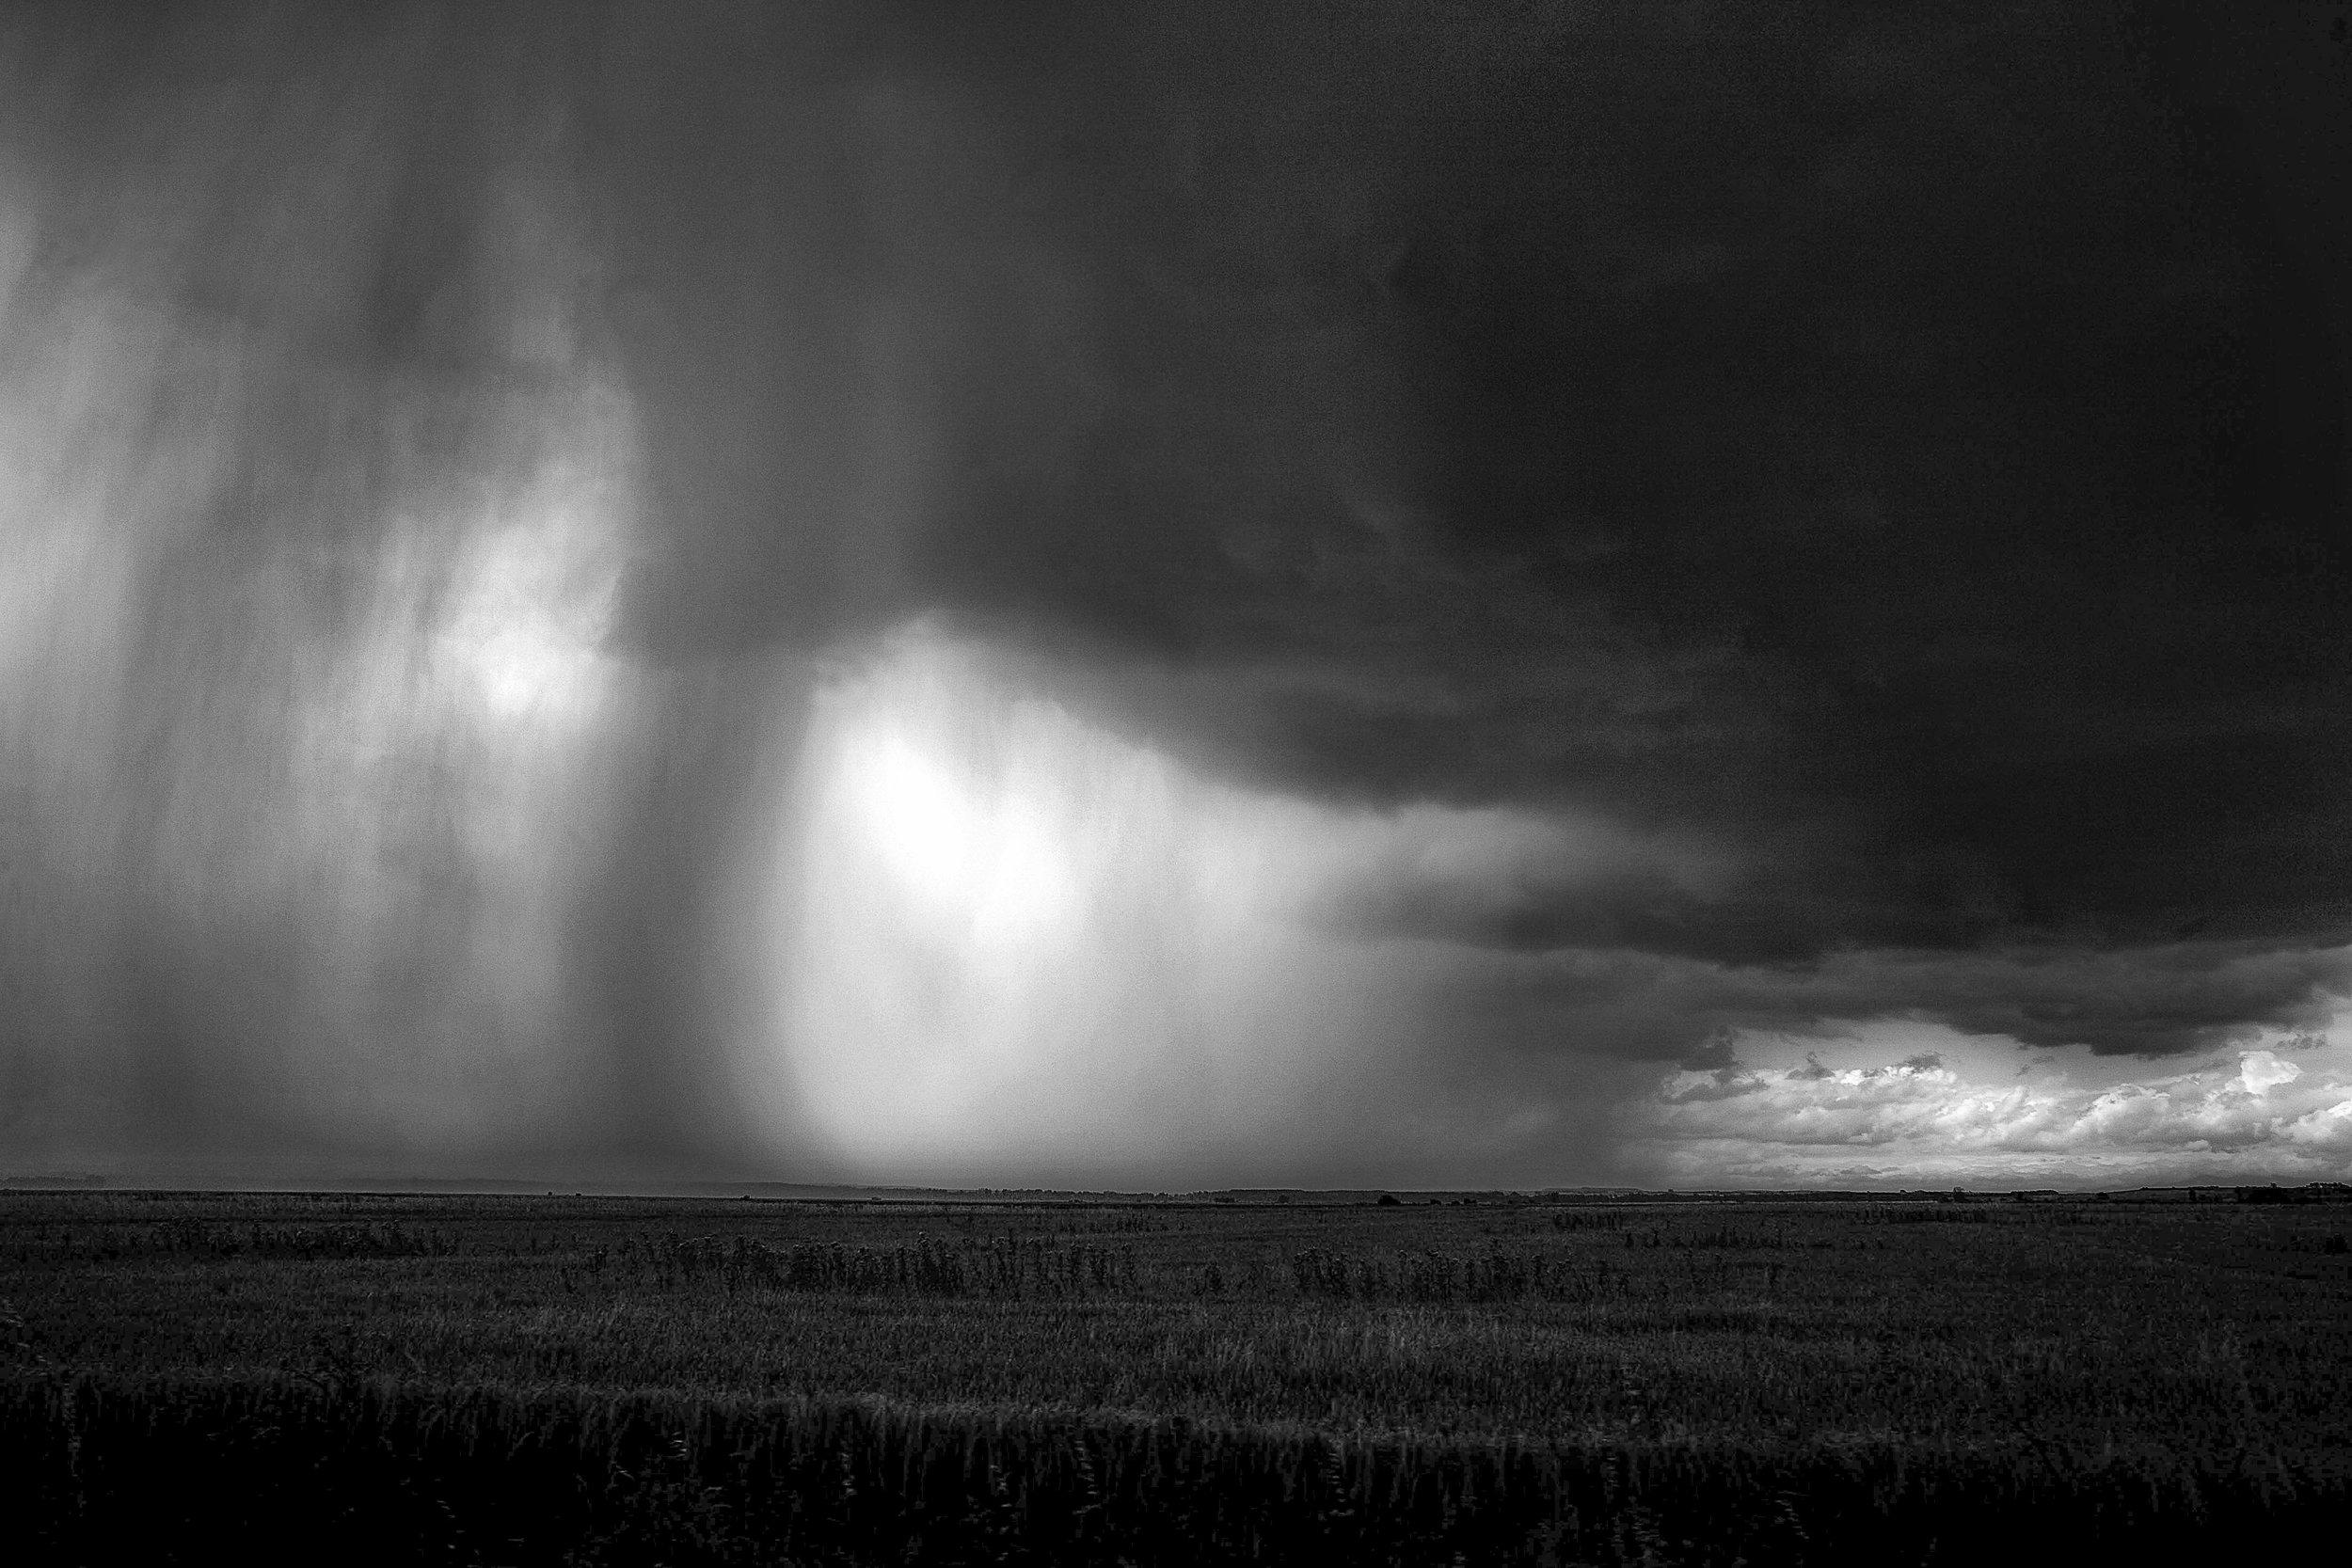 ALD2008CAMINO2_MG_9967-2008-Storm in Arenillas de Río Pisuerga.jpg